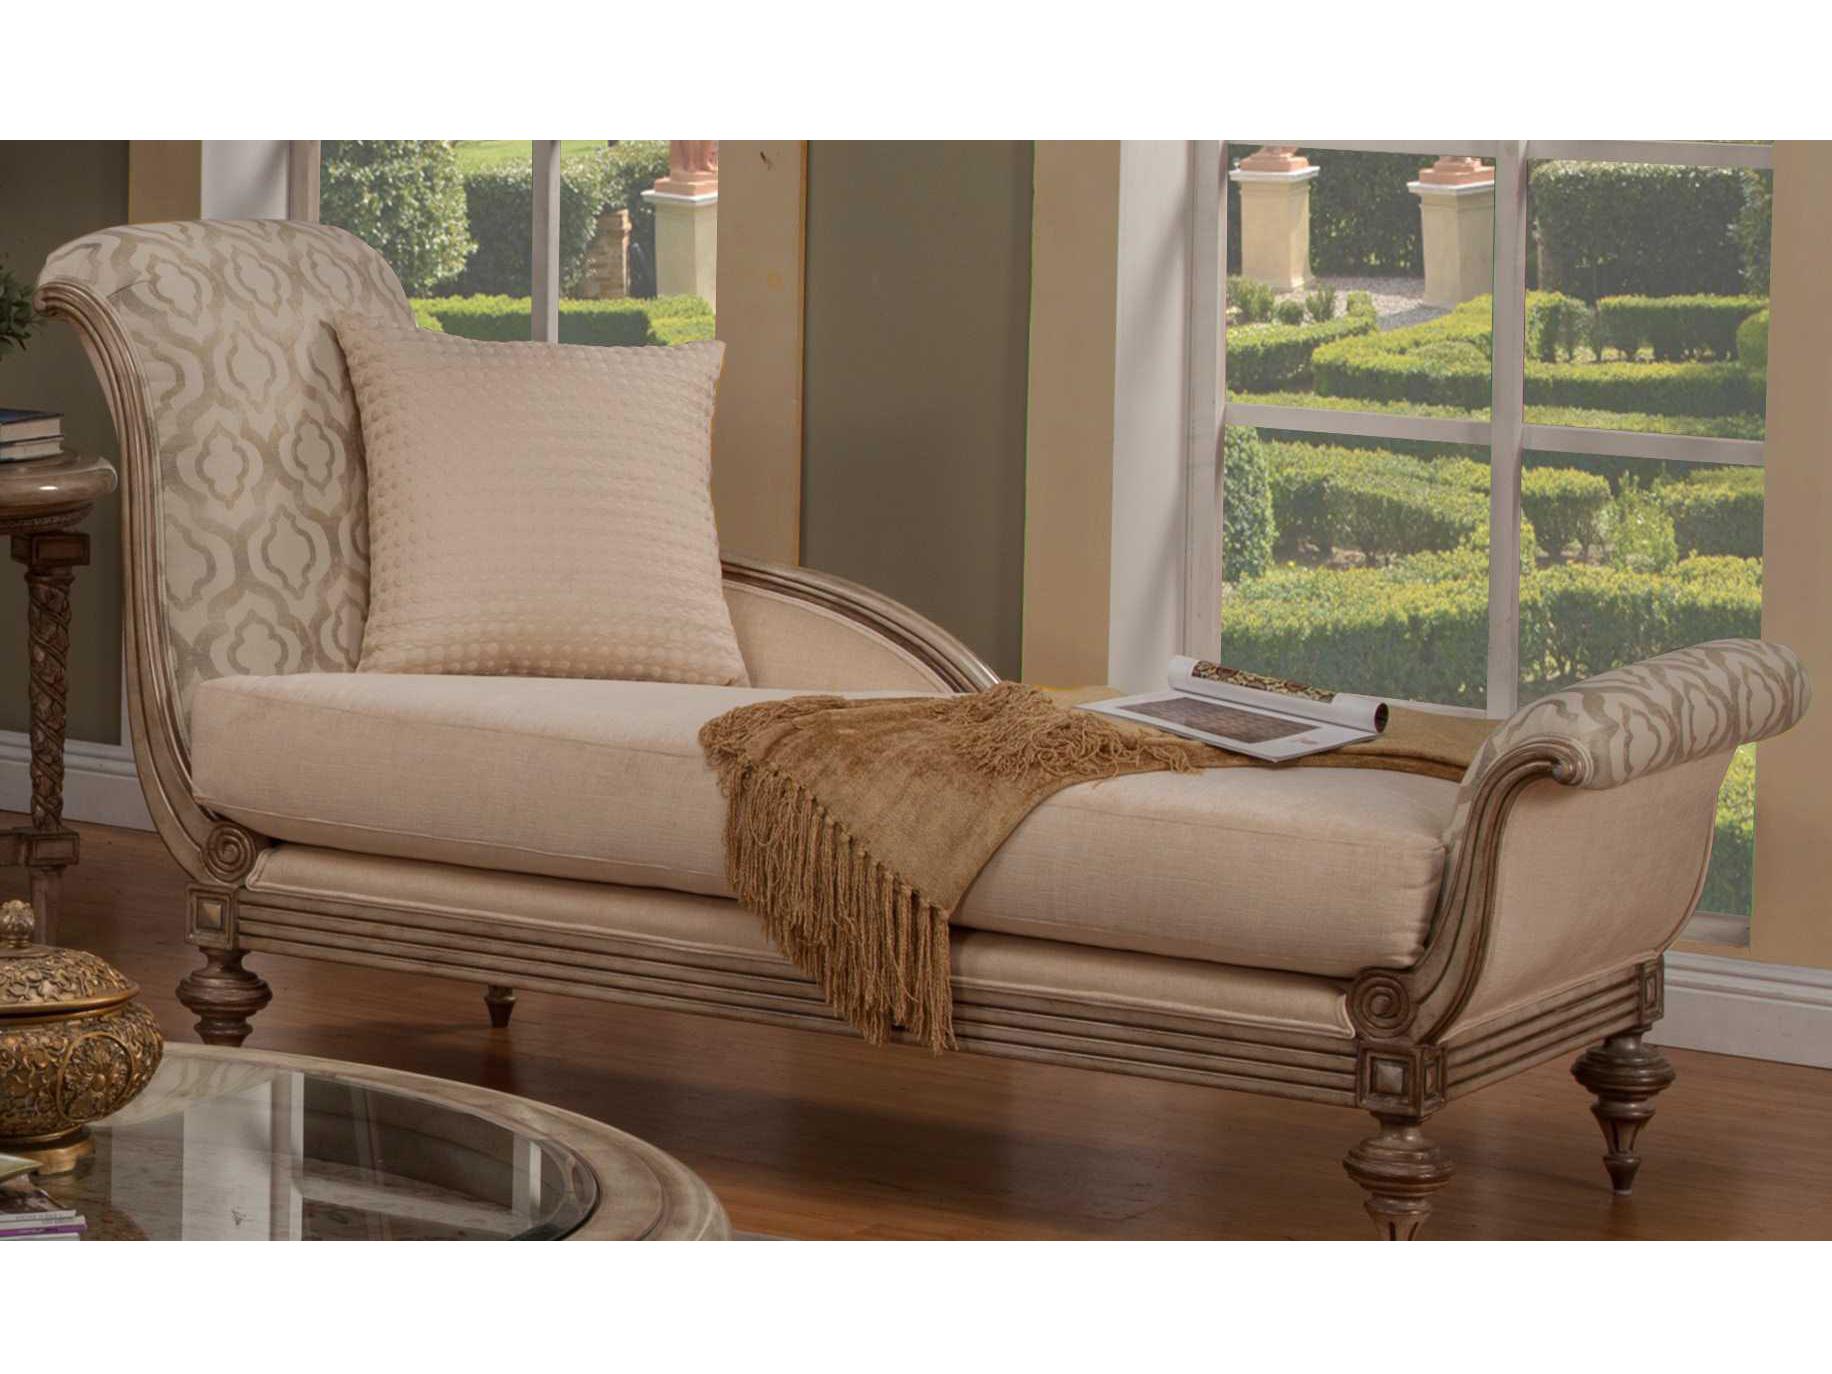 Benetti S Italia Furniture Milerige Chaise Lounge